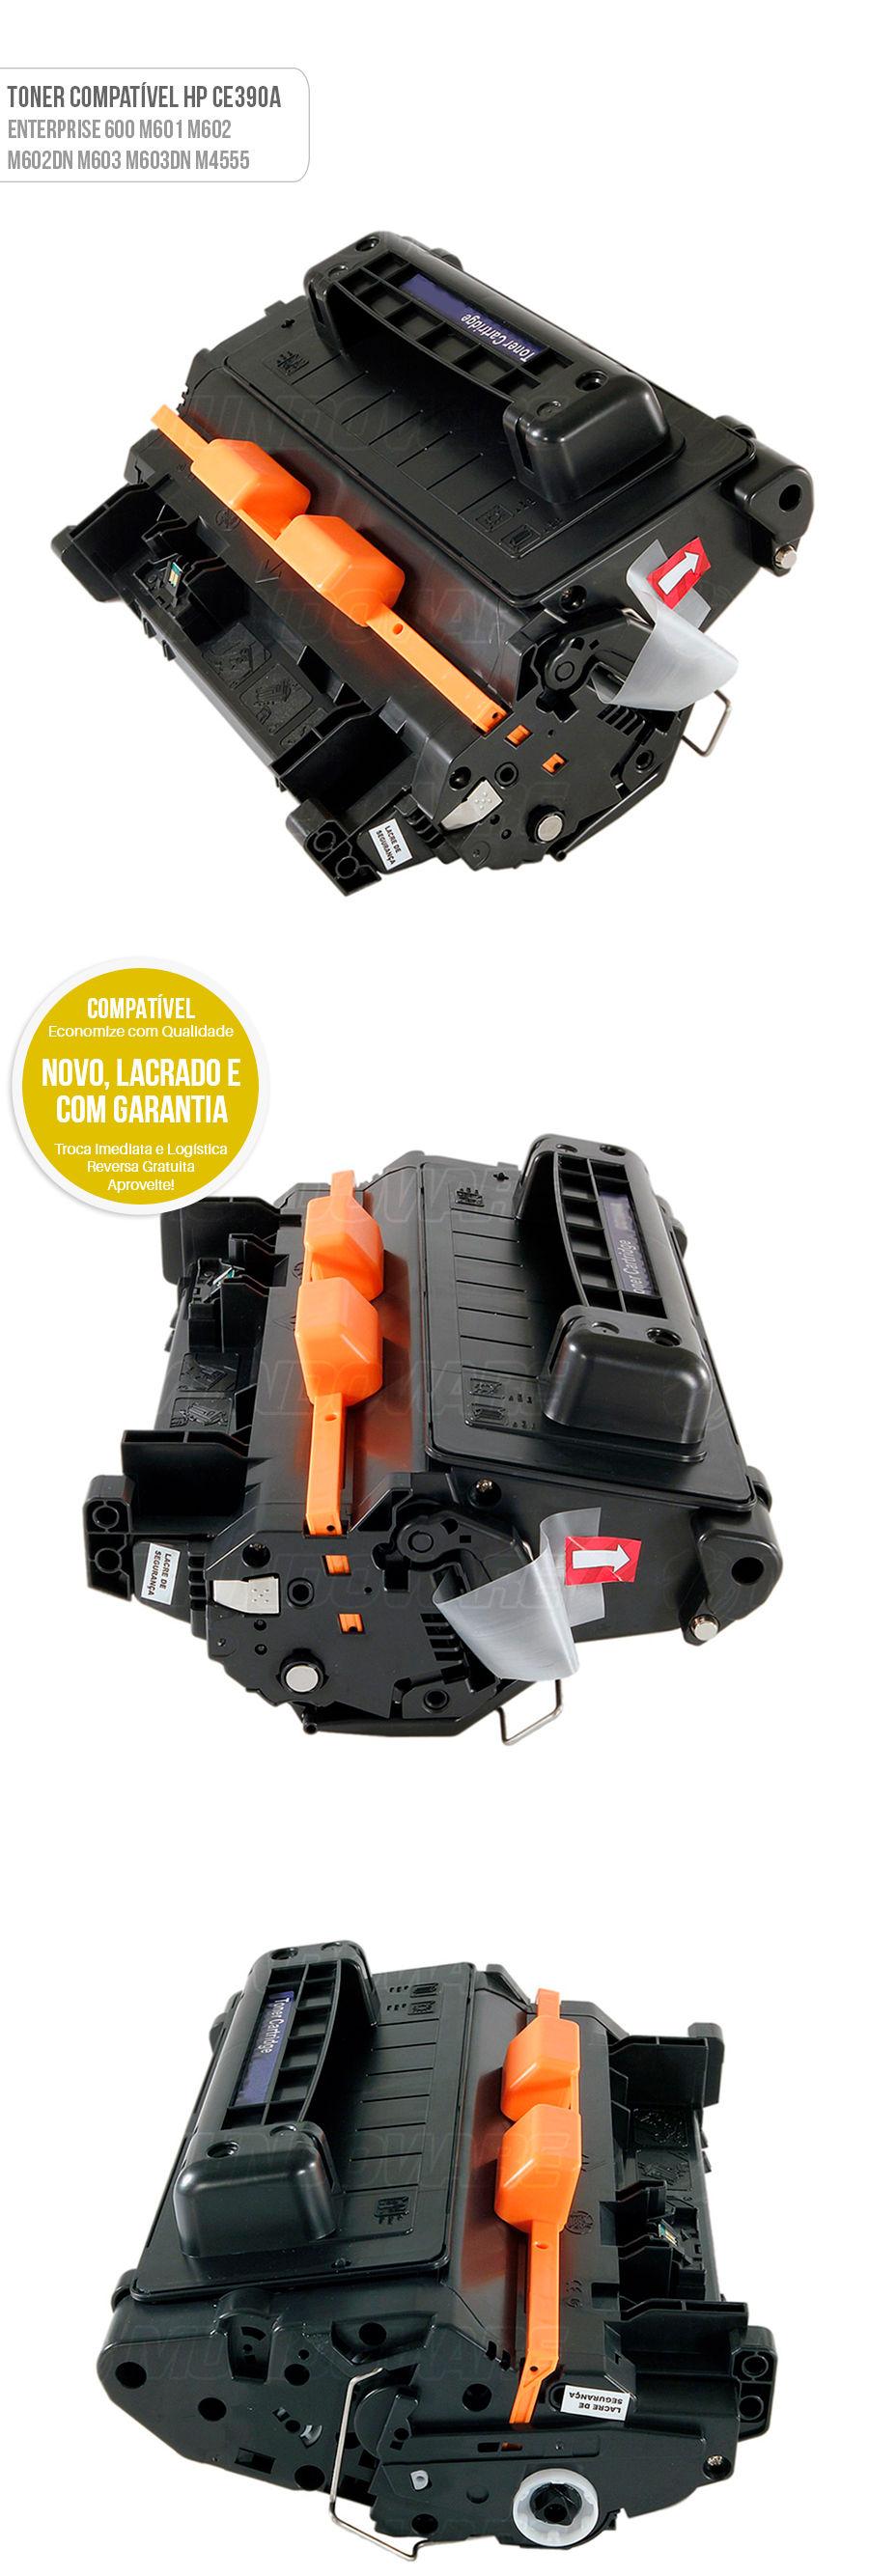 Toner Compativel para M601 M601N M601DN M602 M602DN M602N M602X M603 M603DN M603N M603XH M4555 M4555F M4555DN M4555SFA